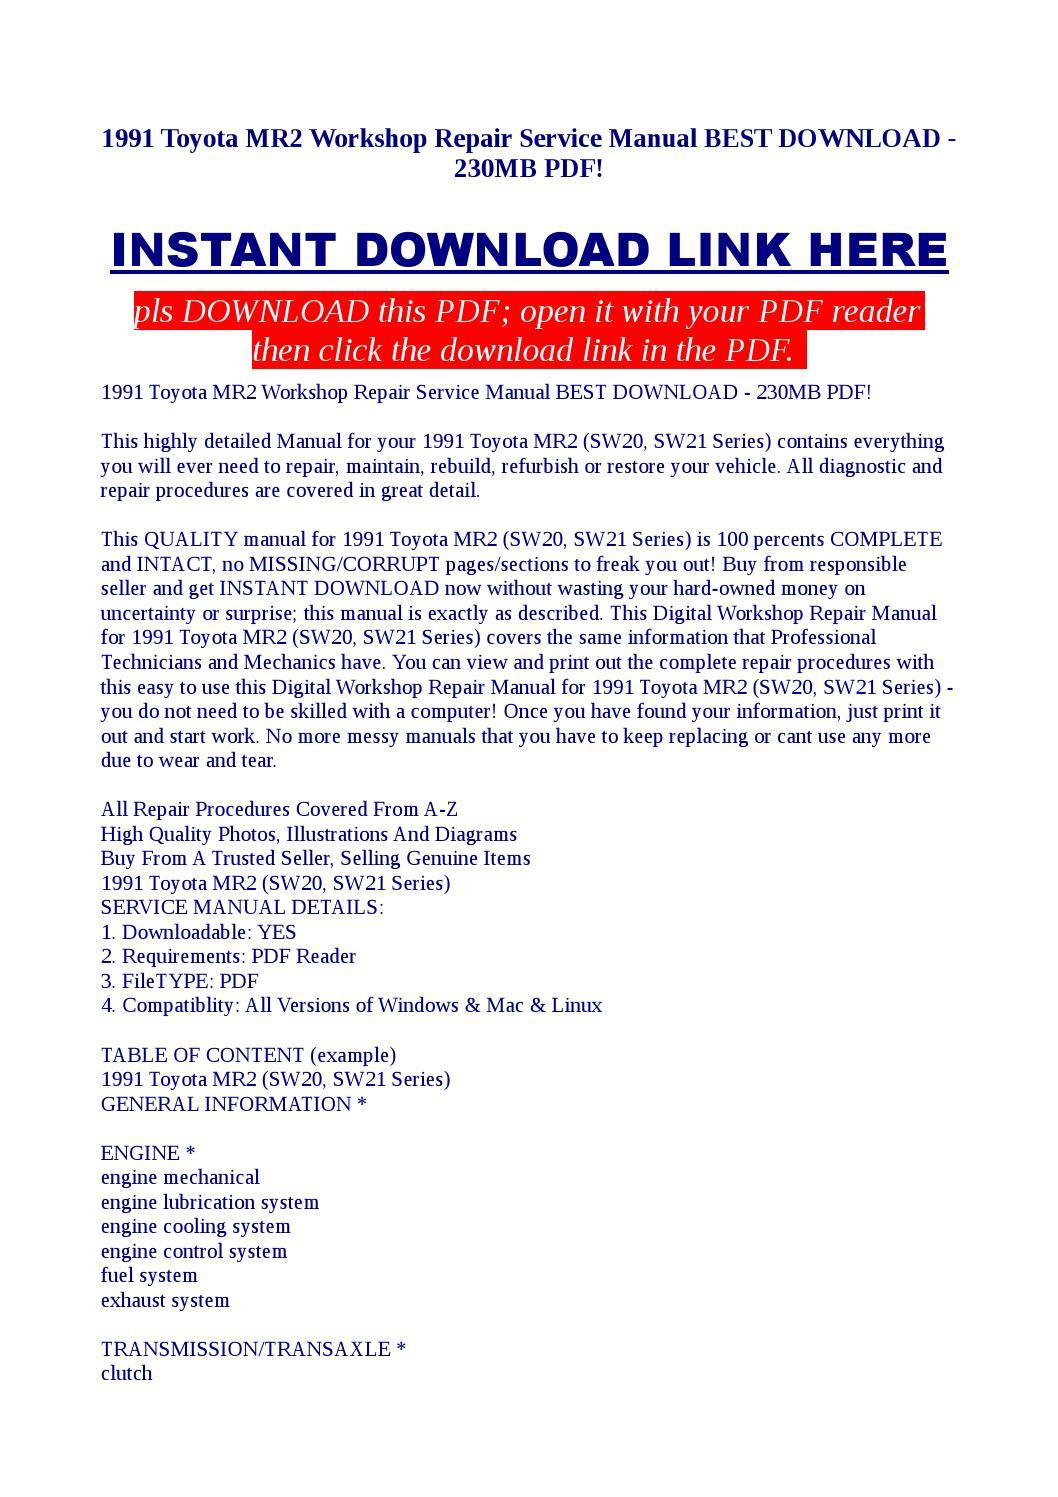 1991 Toyota Mr2 Workshop Repair Service Manual Best Download 230mb Pdf  By Kato Syomo